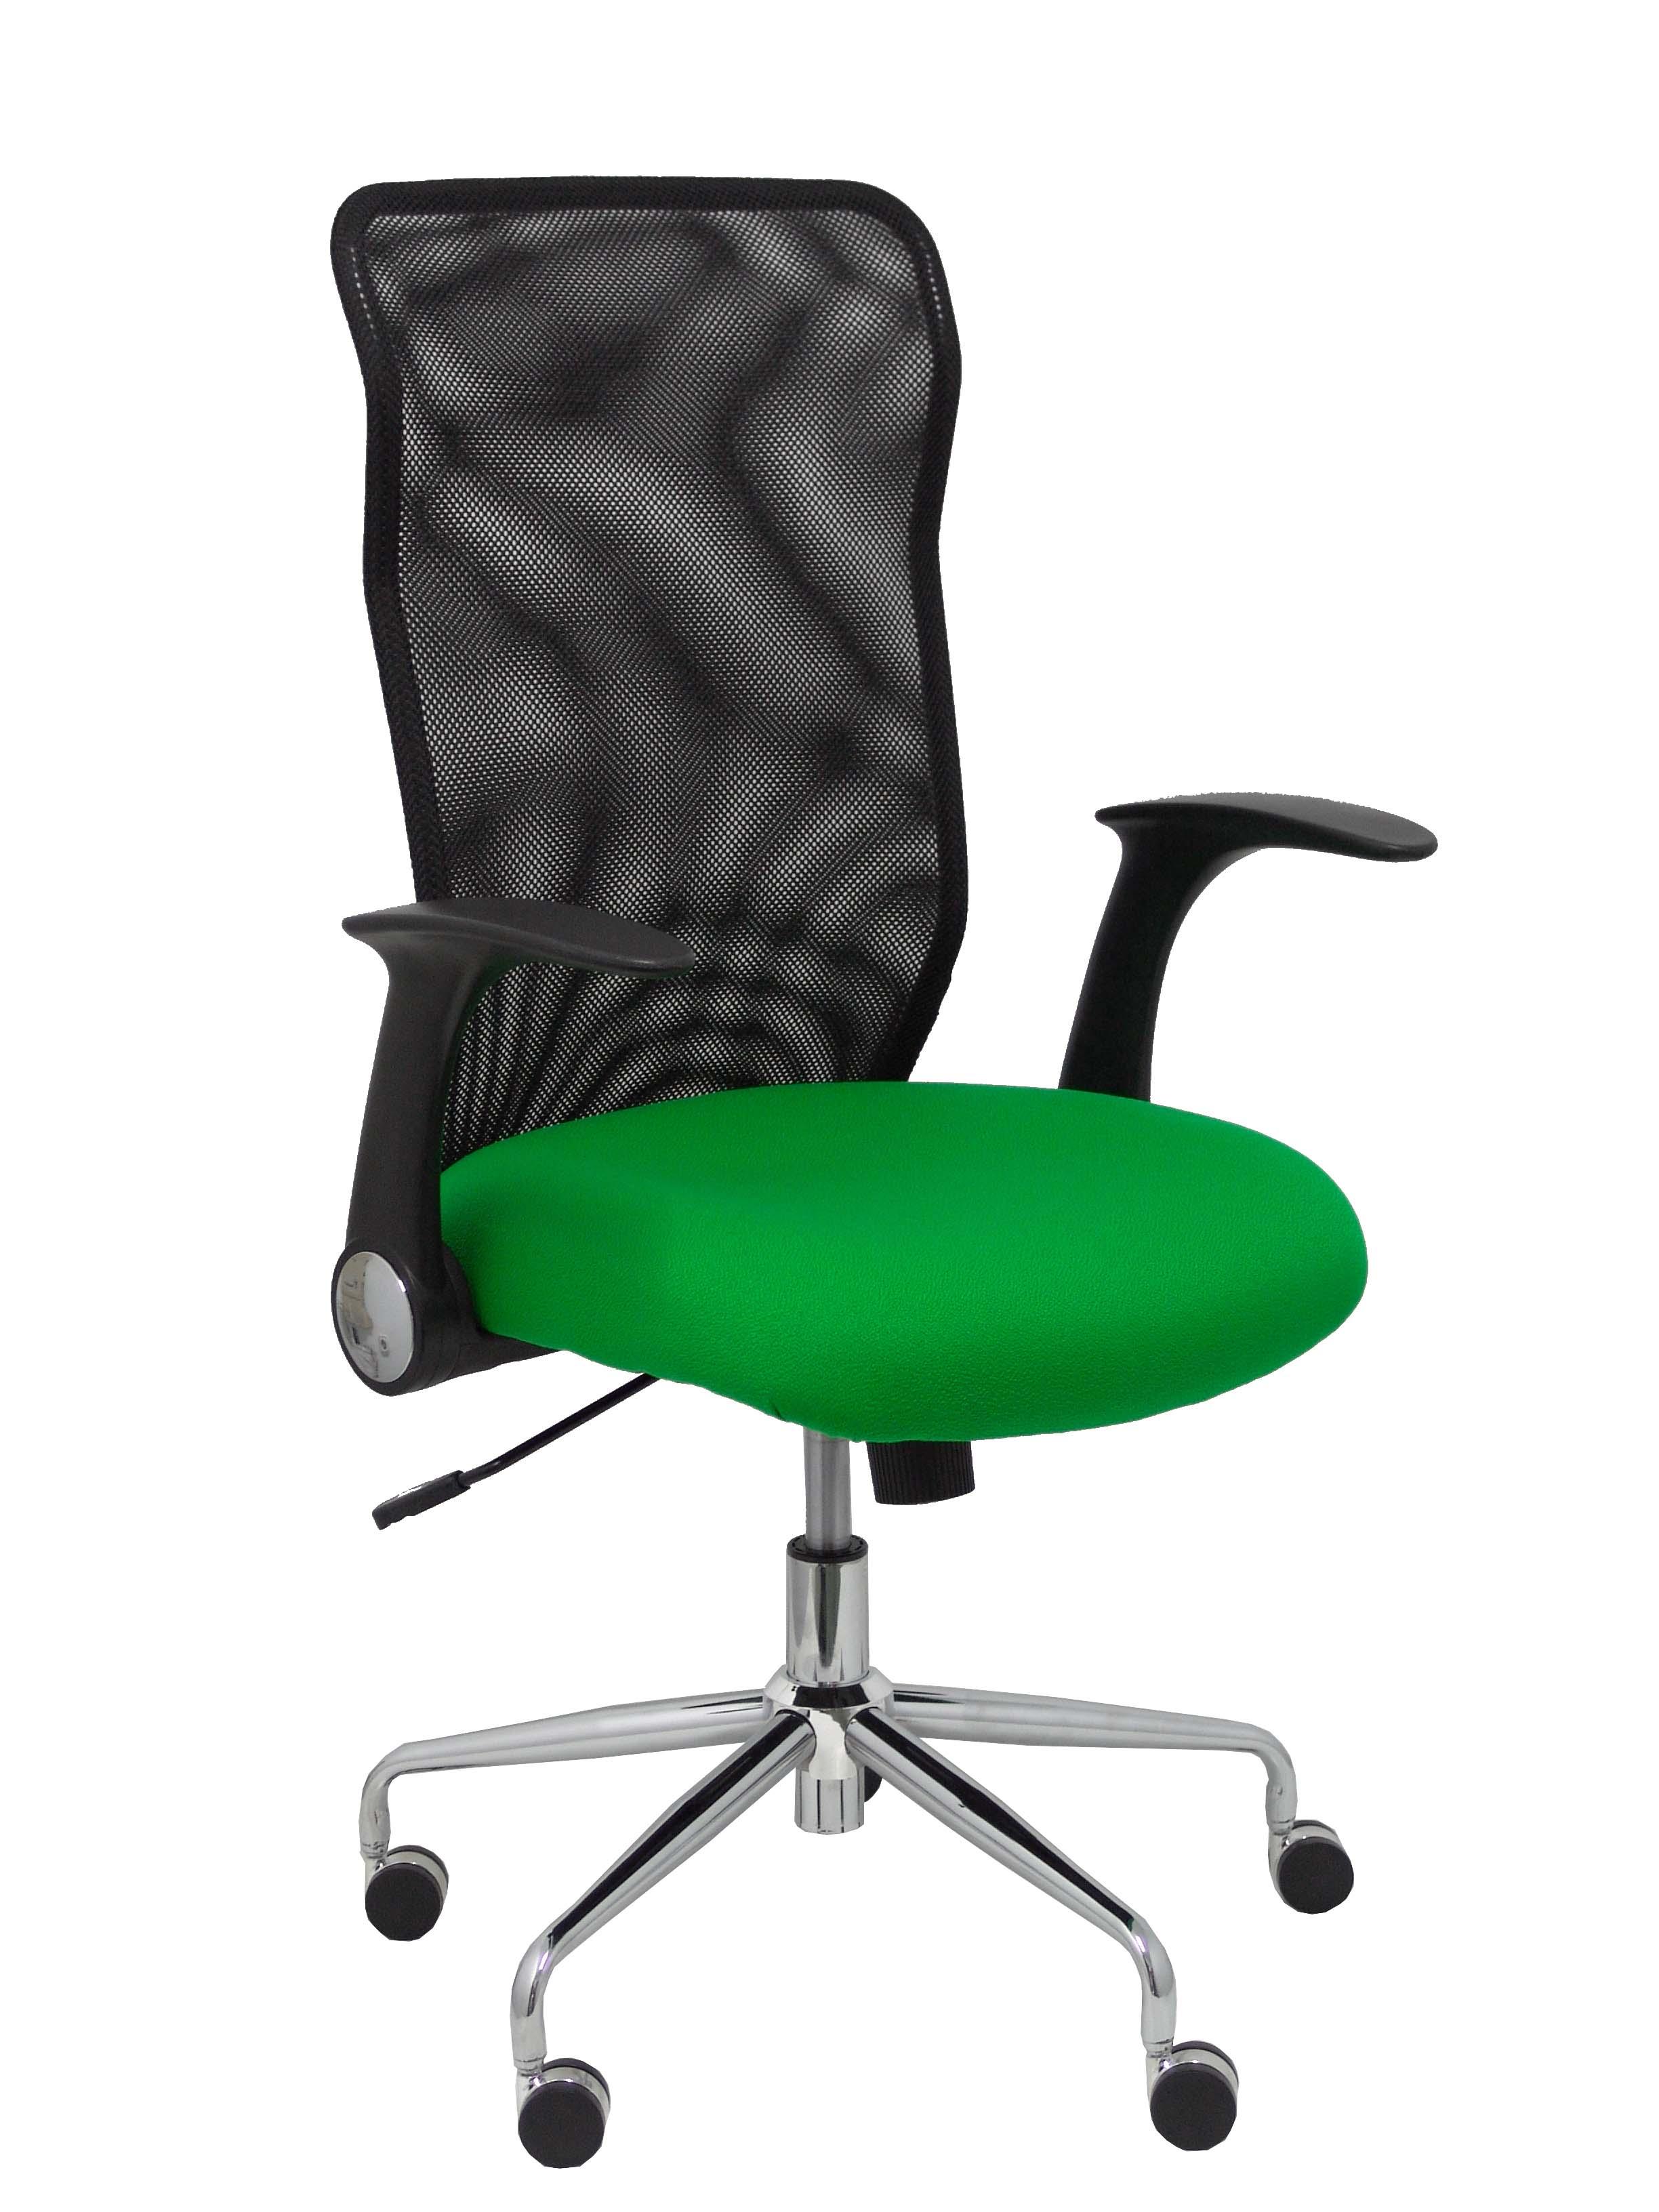 Silla Minaya respaldo malla negro asiento bali verde